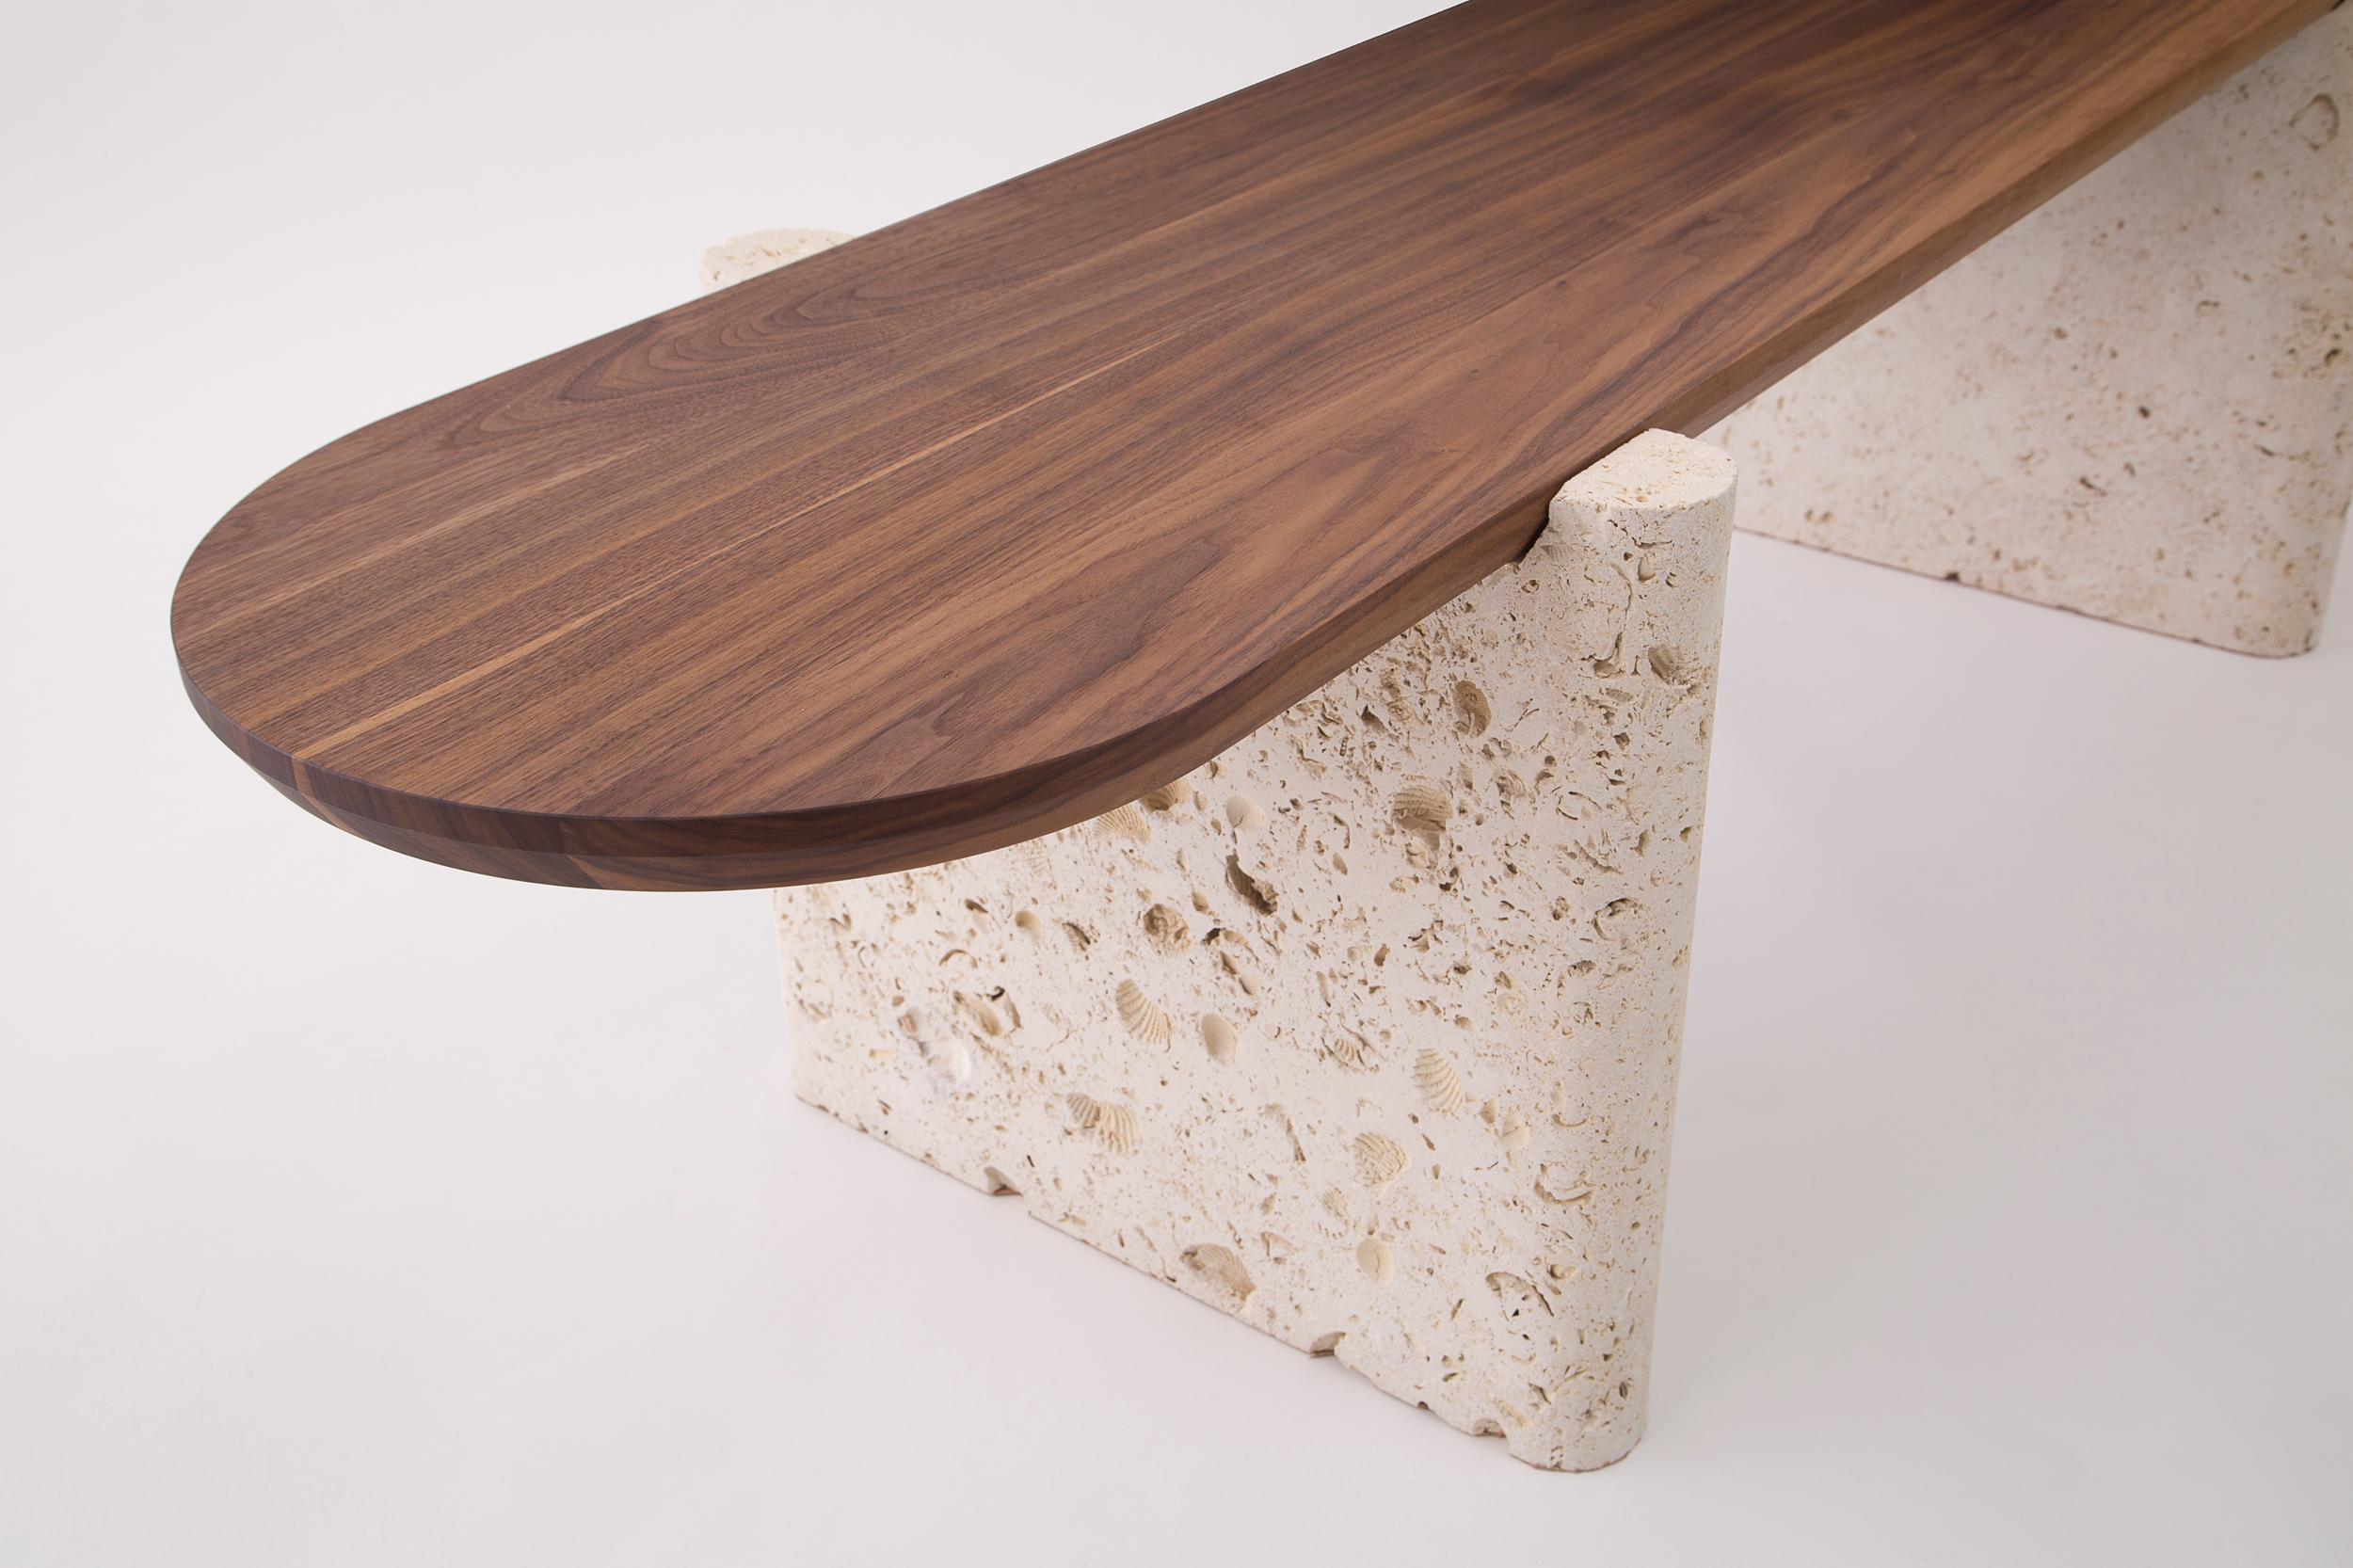 YUCCASTUFF_LAVACA TABLE_VIEW 006.jpg